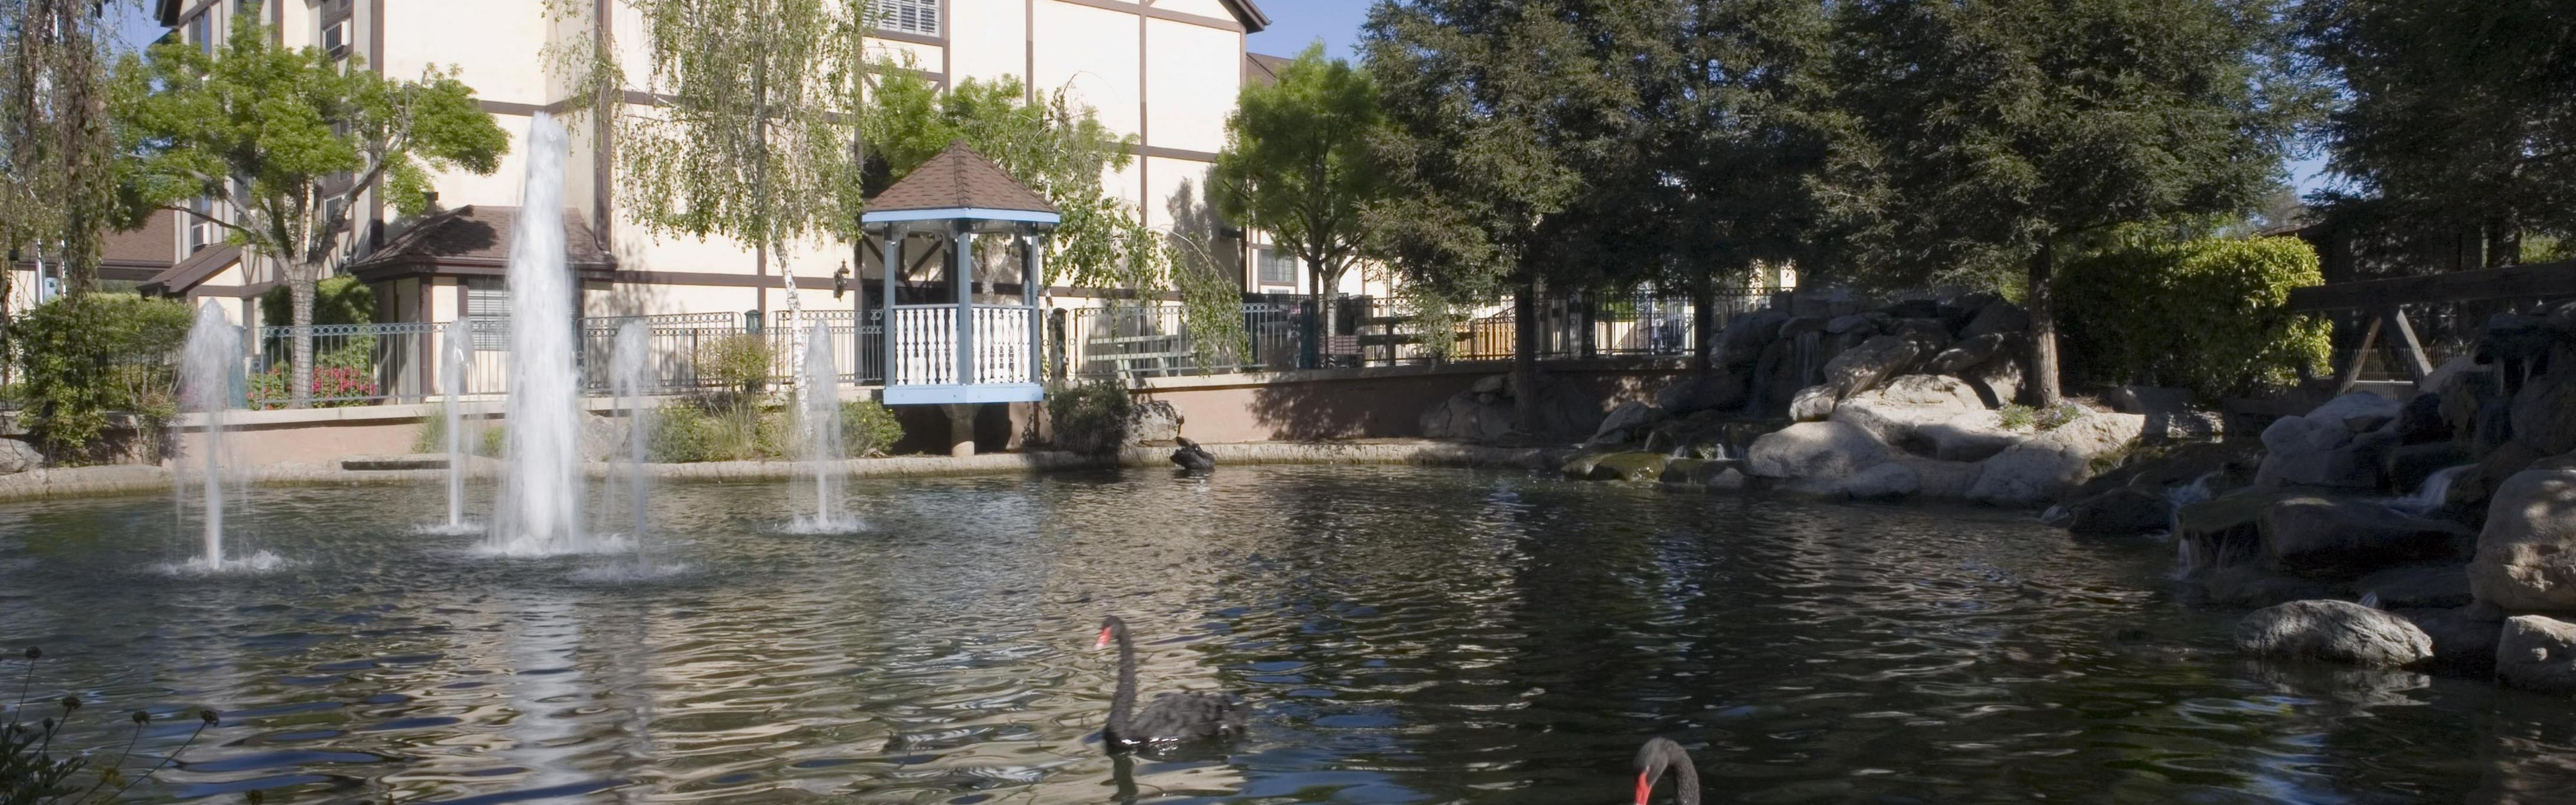 Holiday Inn Selma-Swancourt image 0